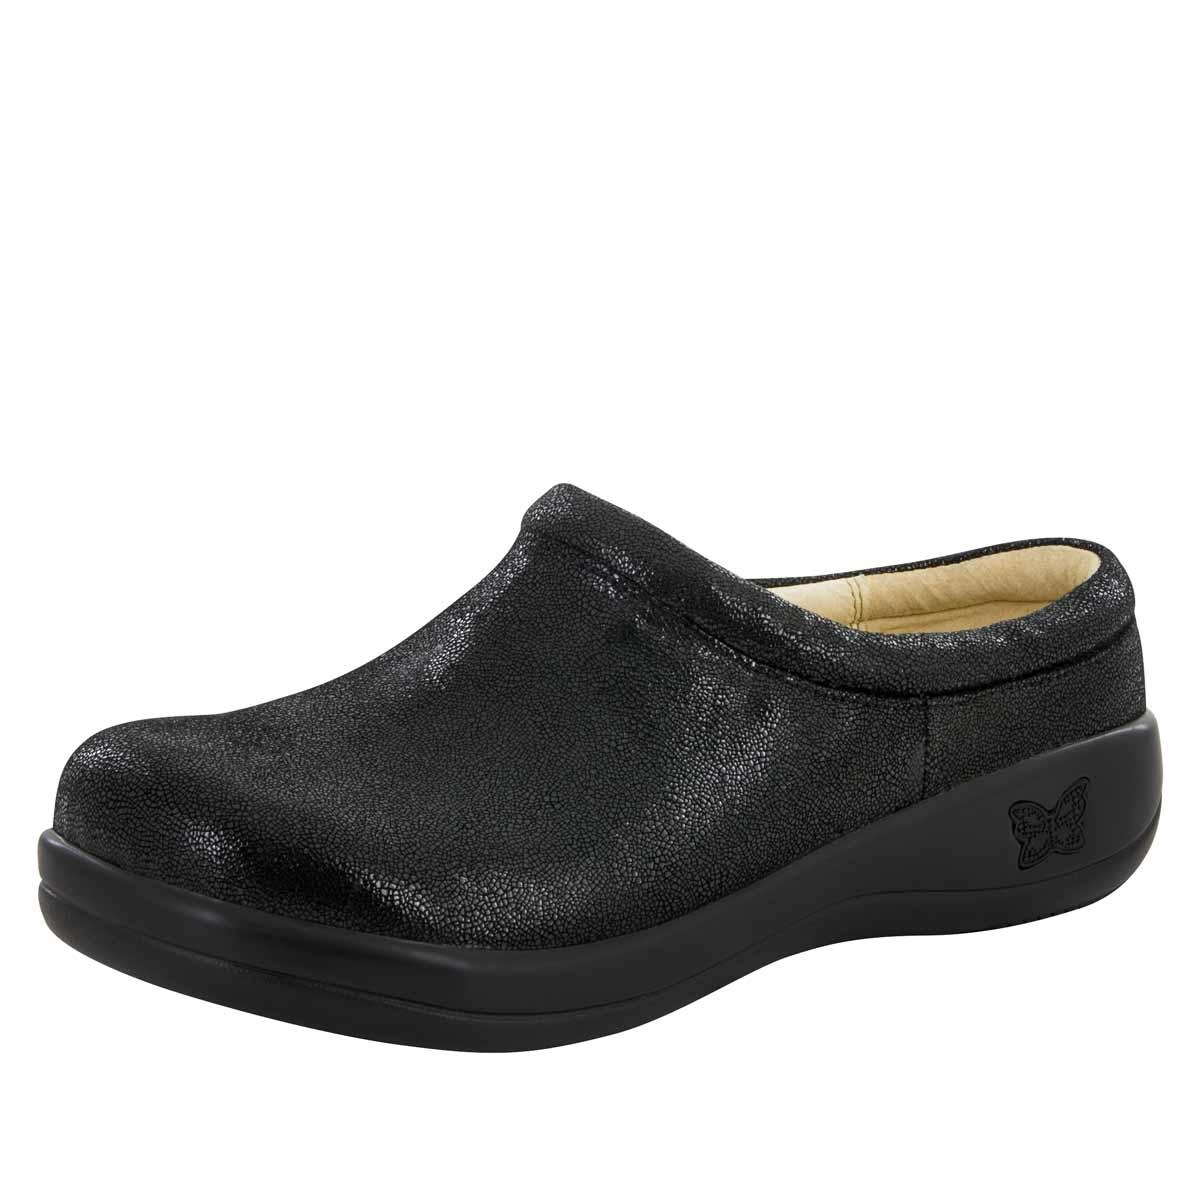 Alegria Women's Kayla Shoe Black Leather Clog Mule Licorice Soft Serve Shoes